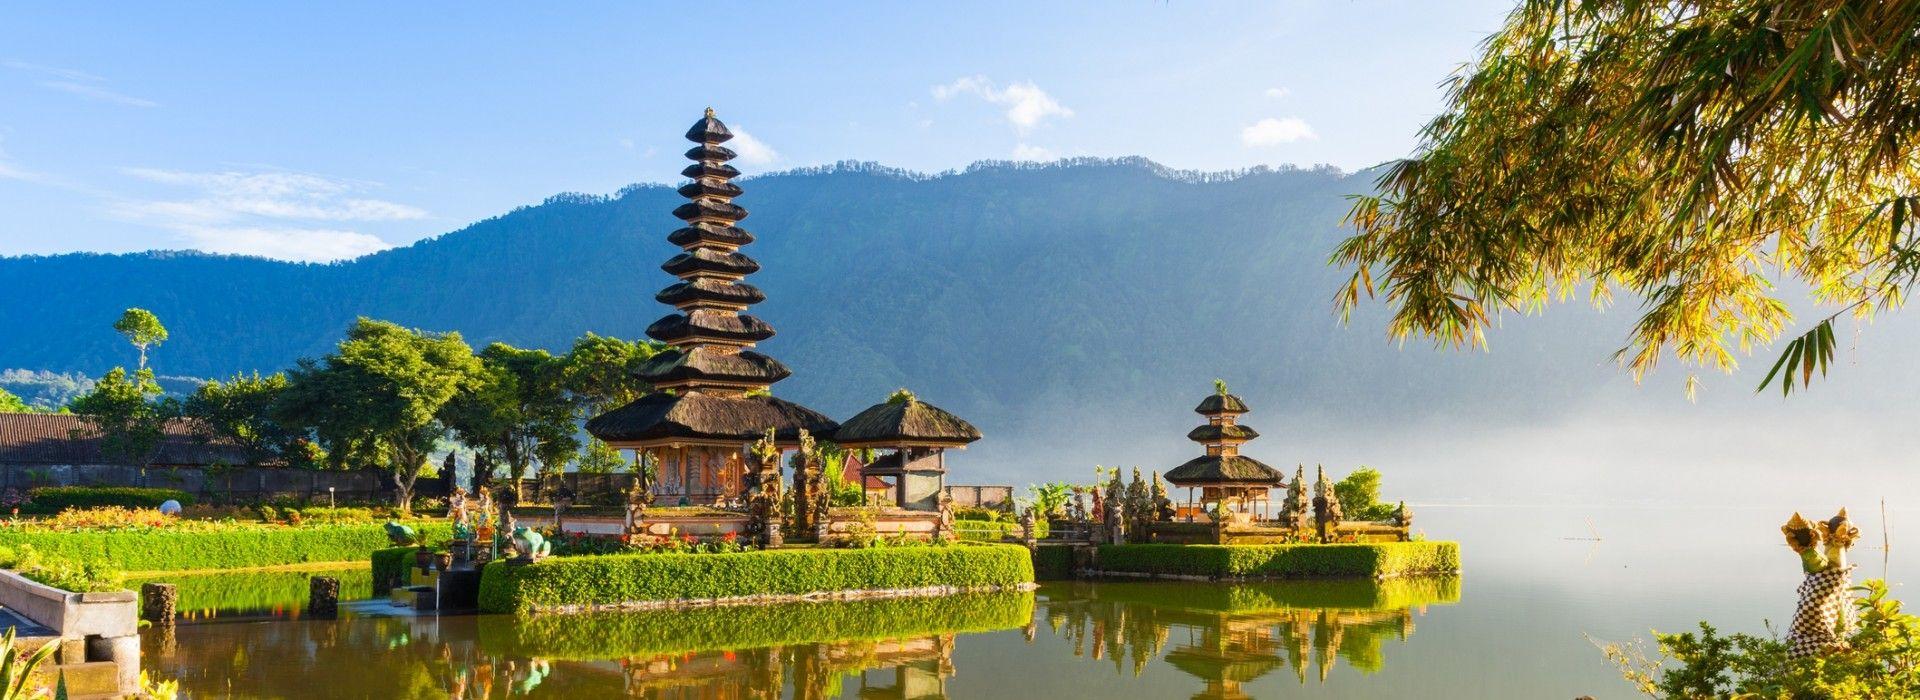 Spas Tours in Indonesia